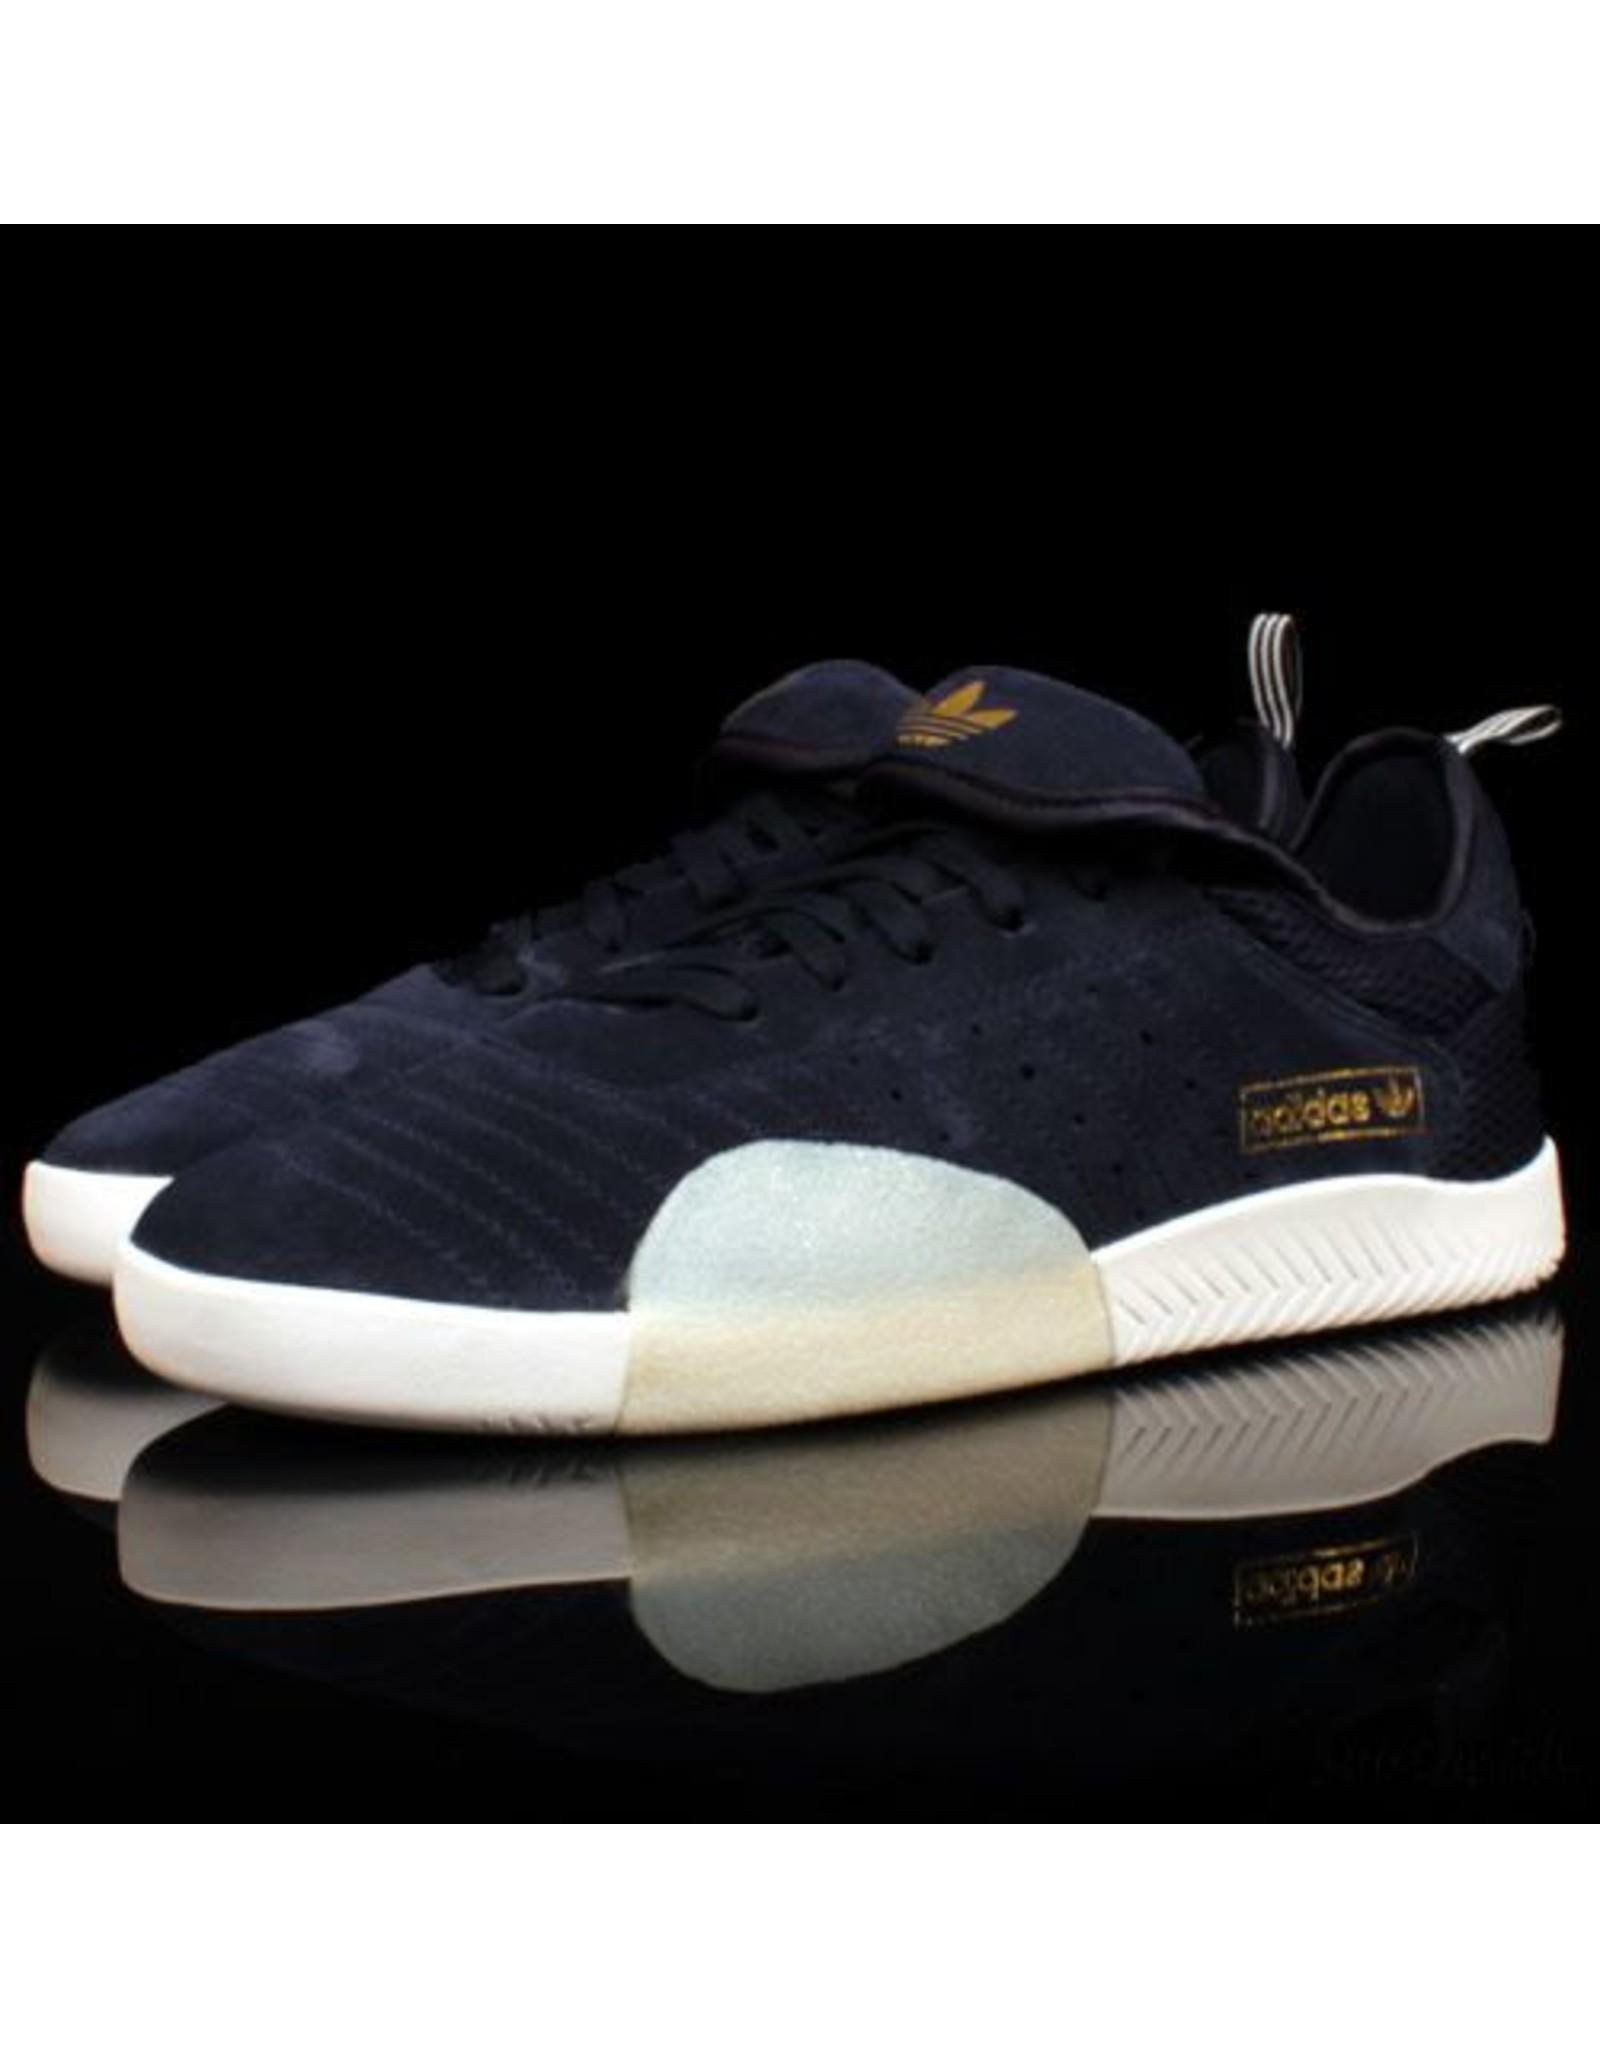 ADIDAS Adidas 3ST 003 Navy White Gum